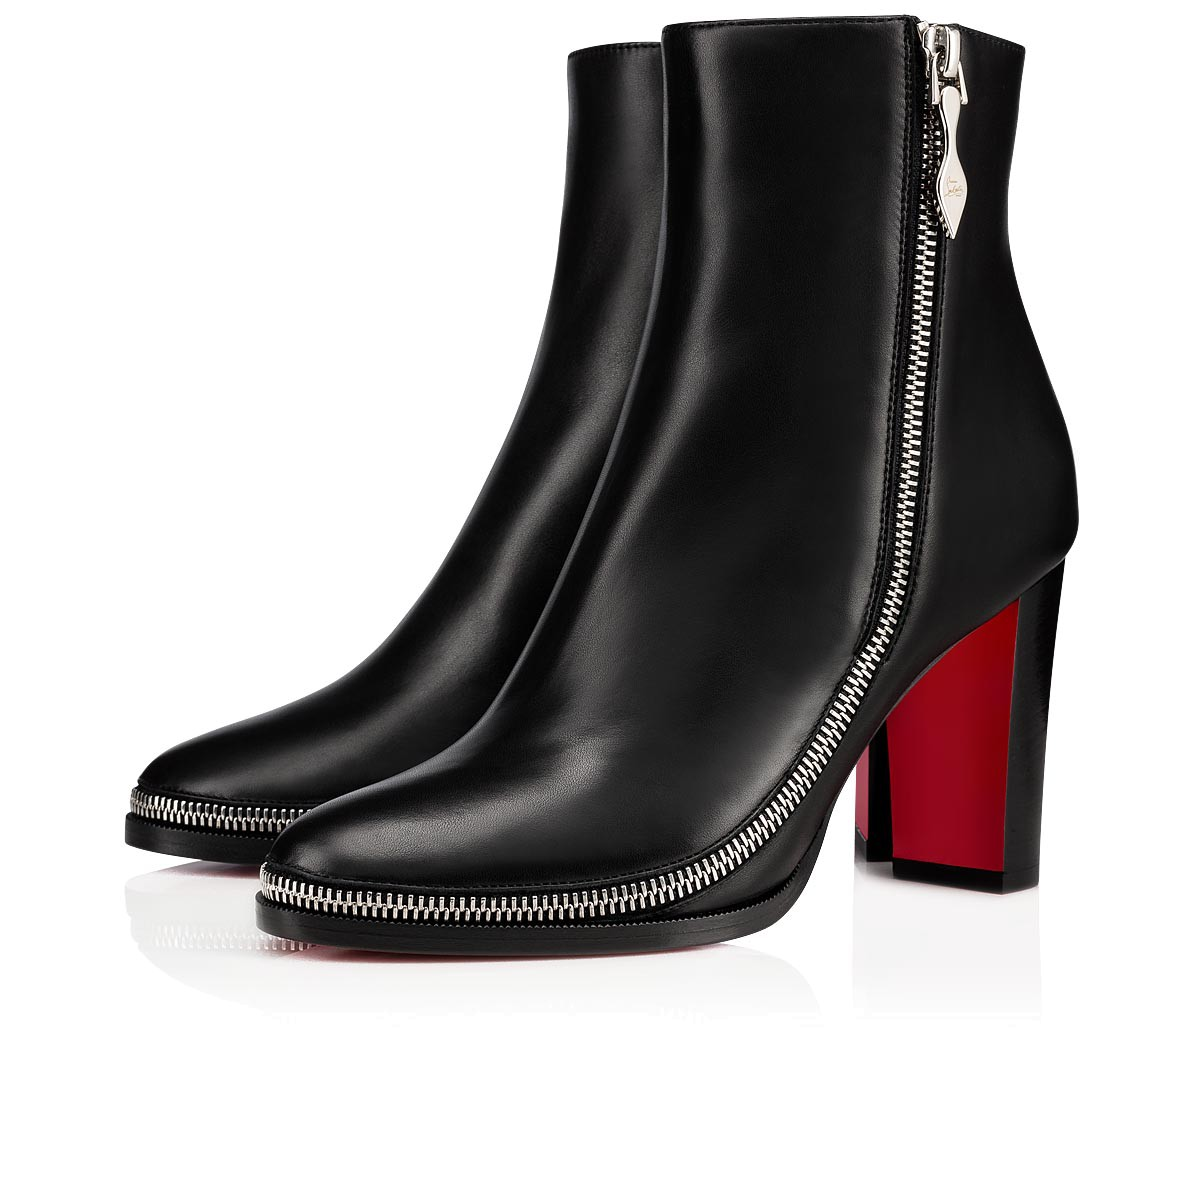 release date: 82d60 3a28b Telezip 85 Black/Black Lucido Leather - Women Shoes - Christian Louboutin